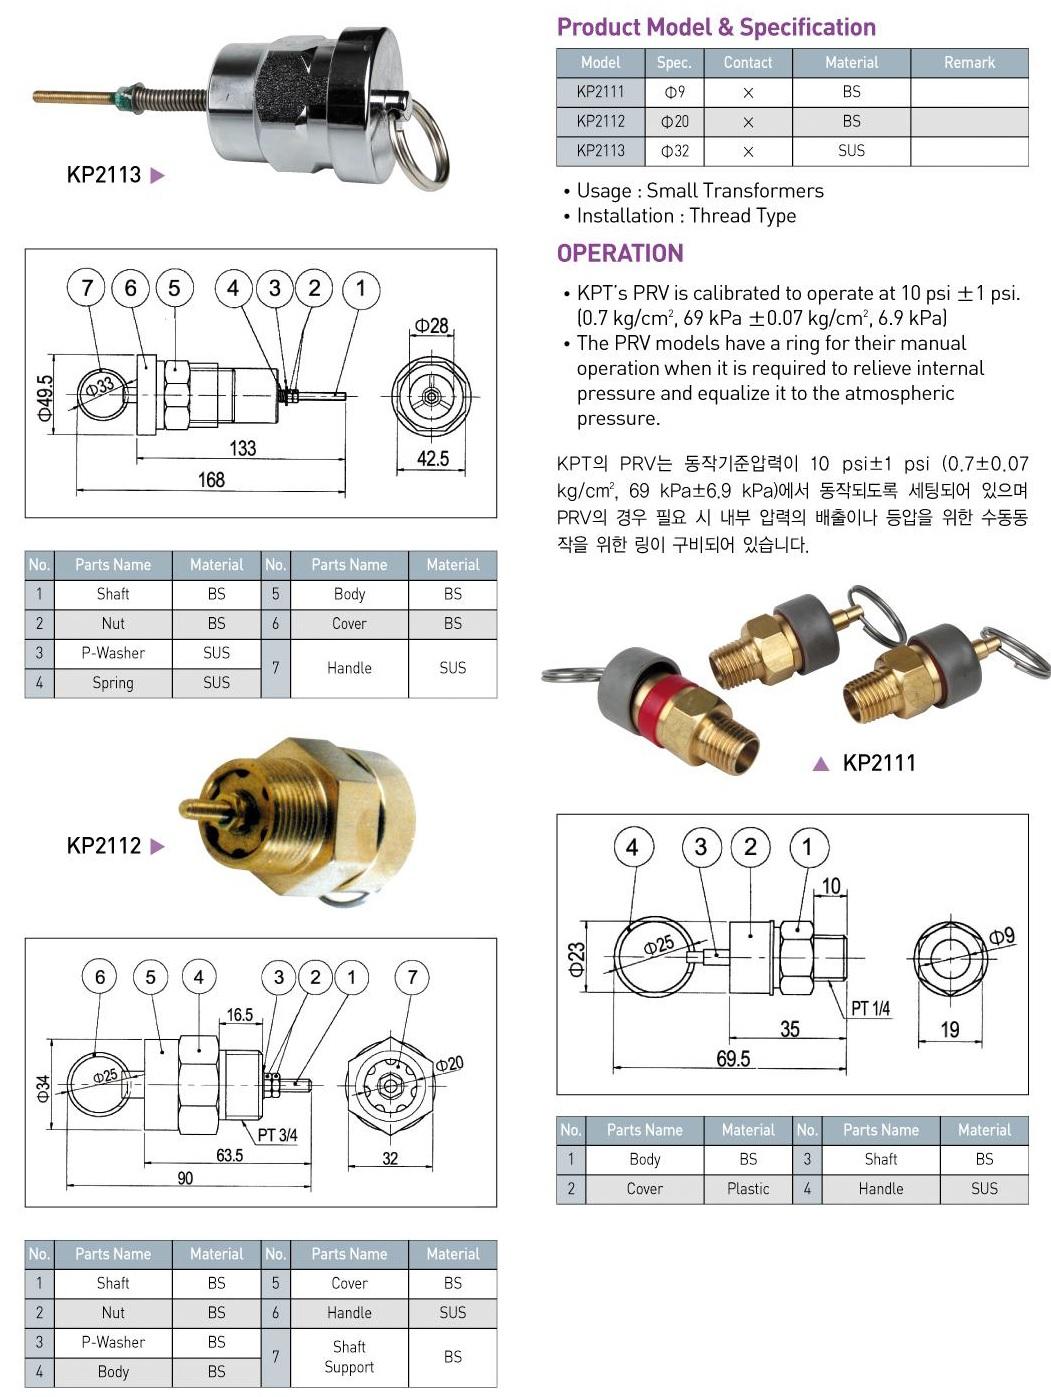 Transformer Pressure Relief Valve(PRV)